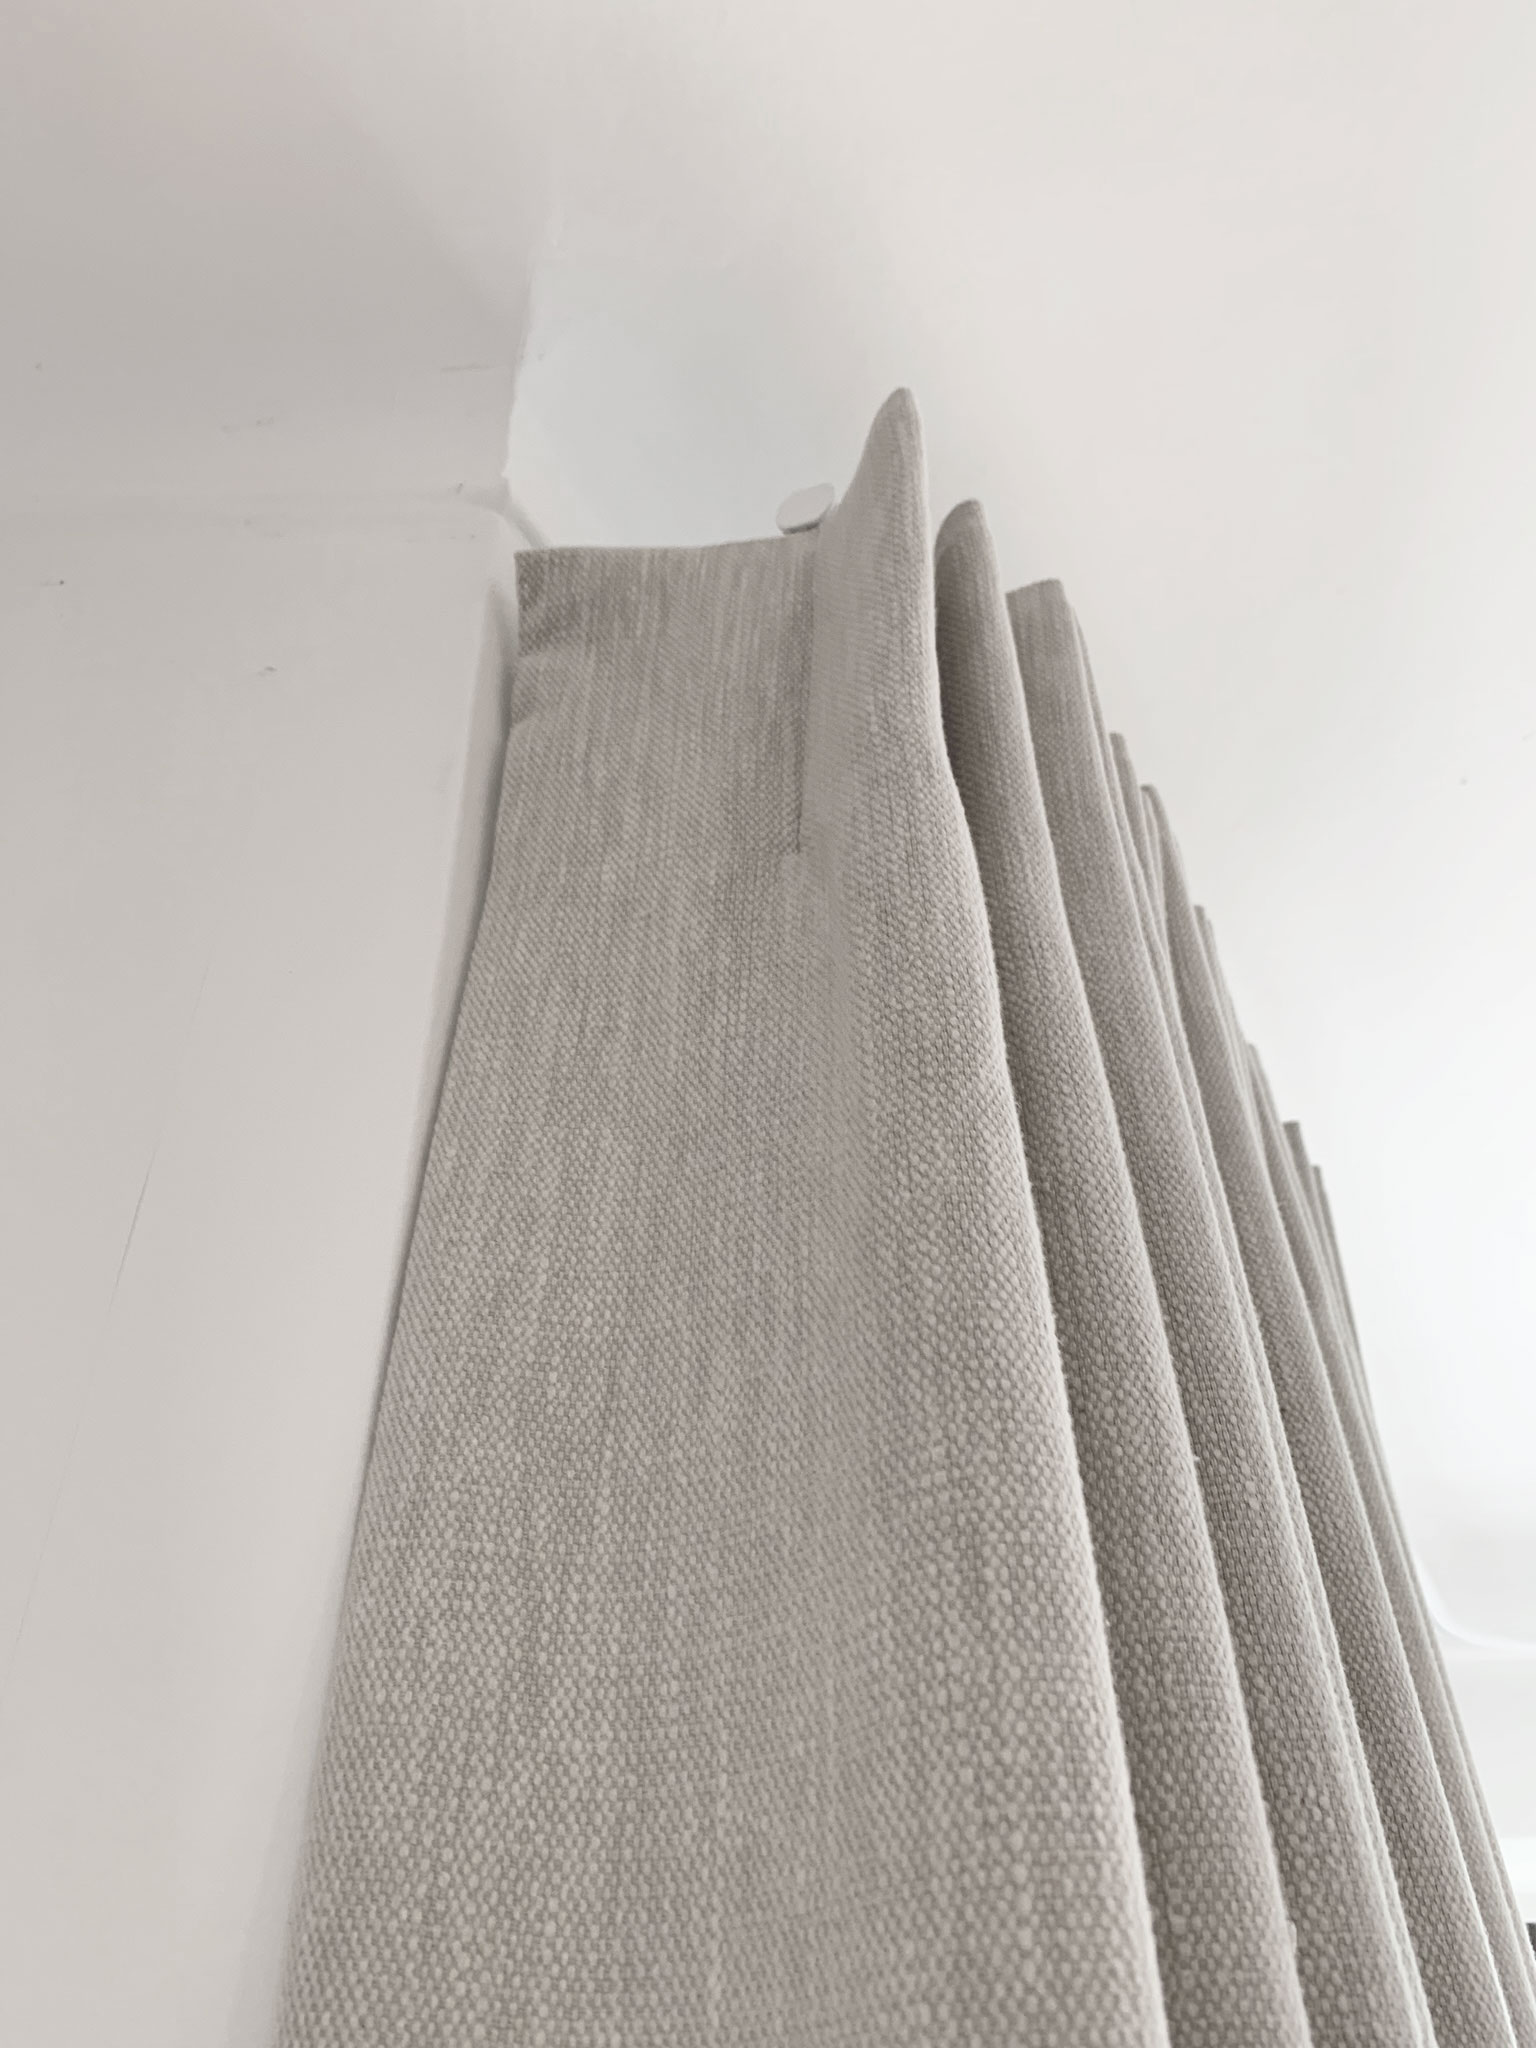 Taylor and Paix, Curtain Makers Sevenoaks